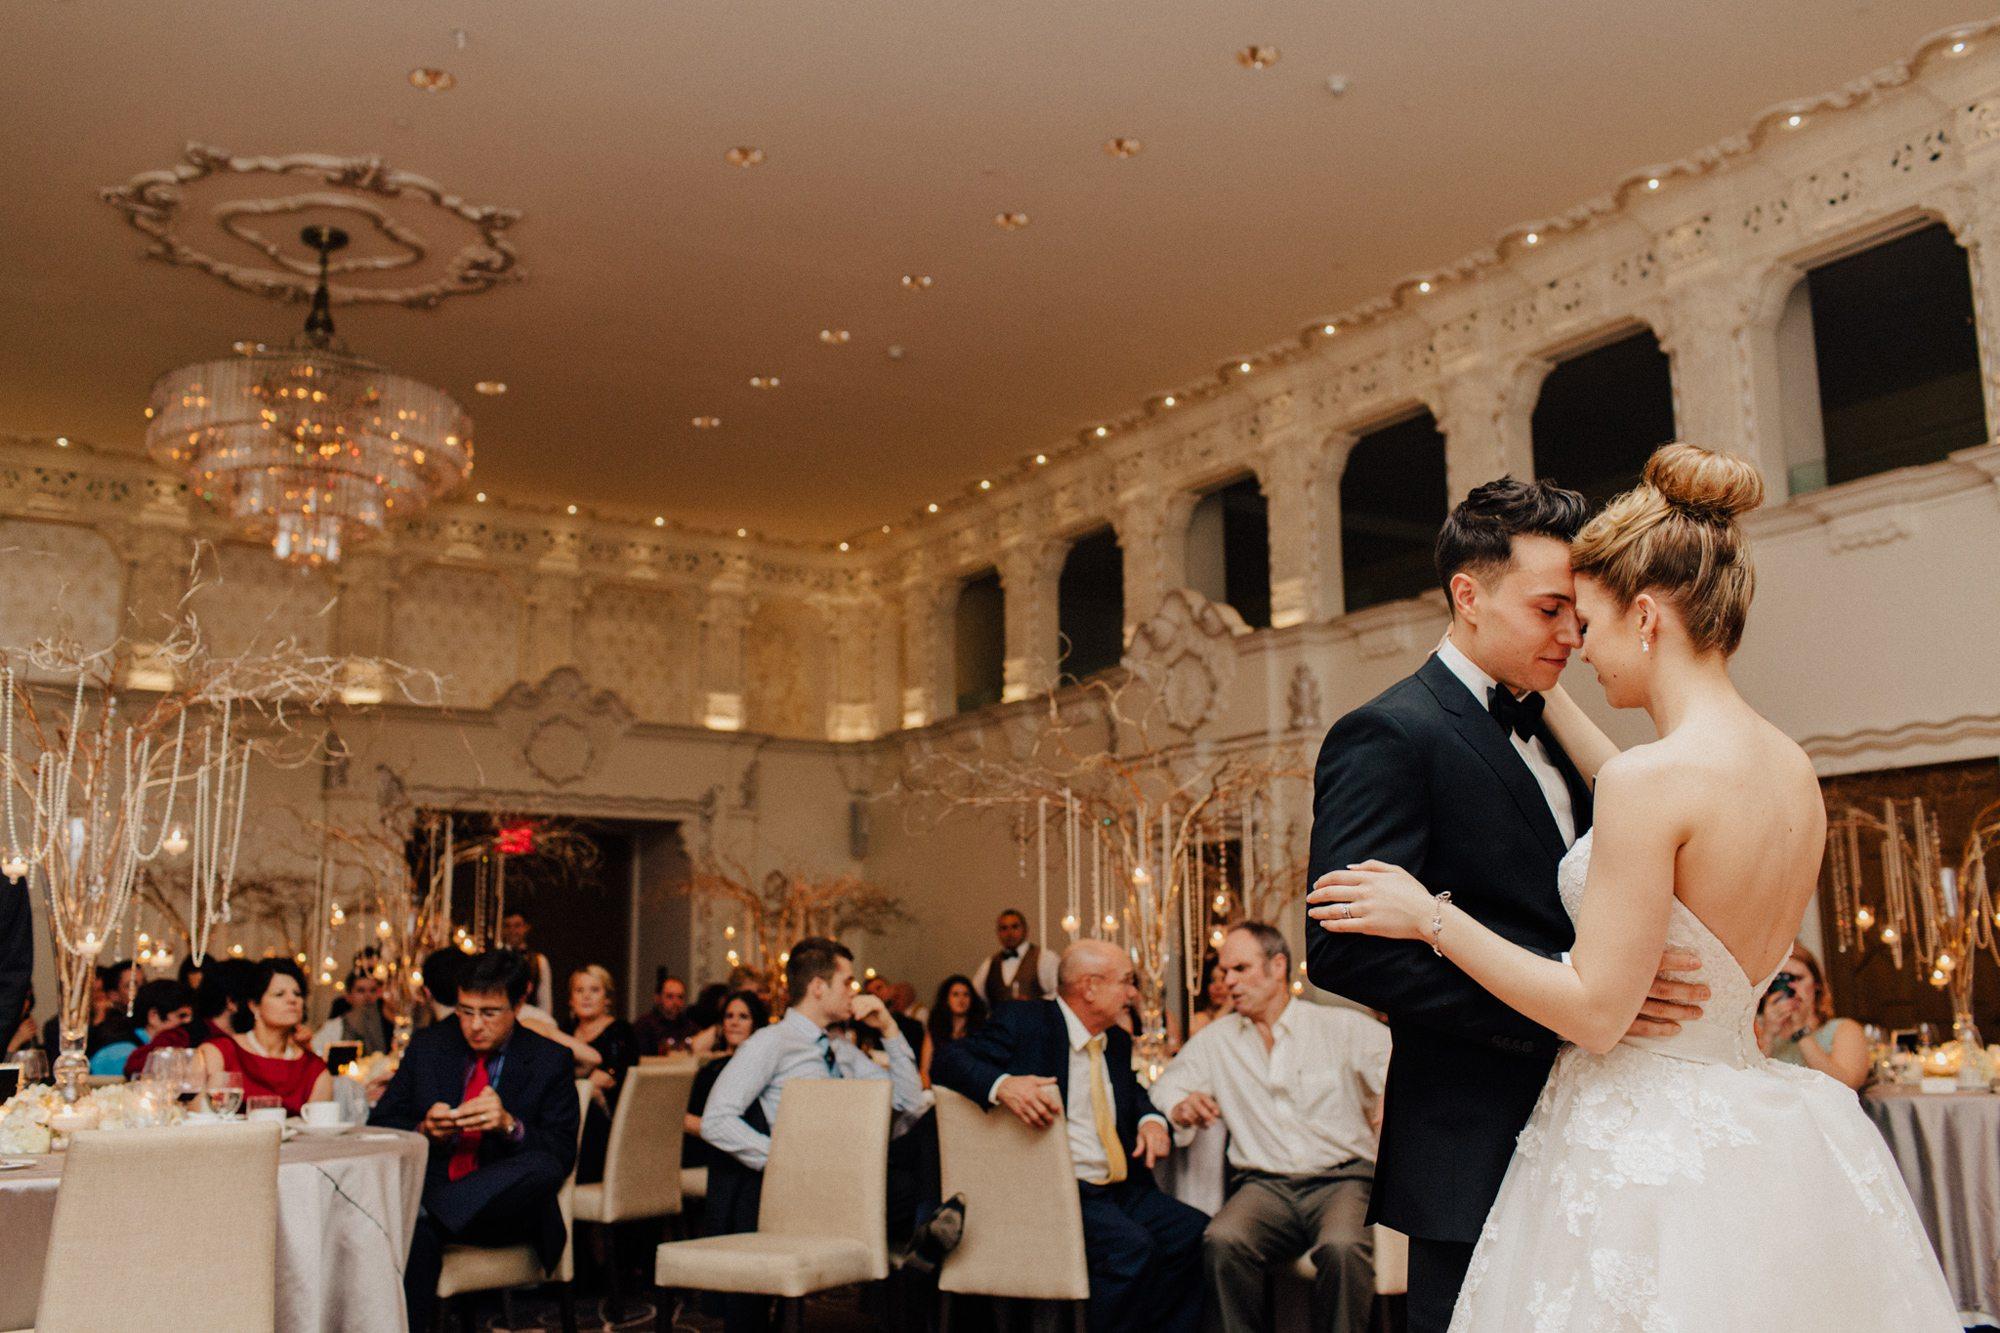 079-vancouver-wedding-photographer